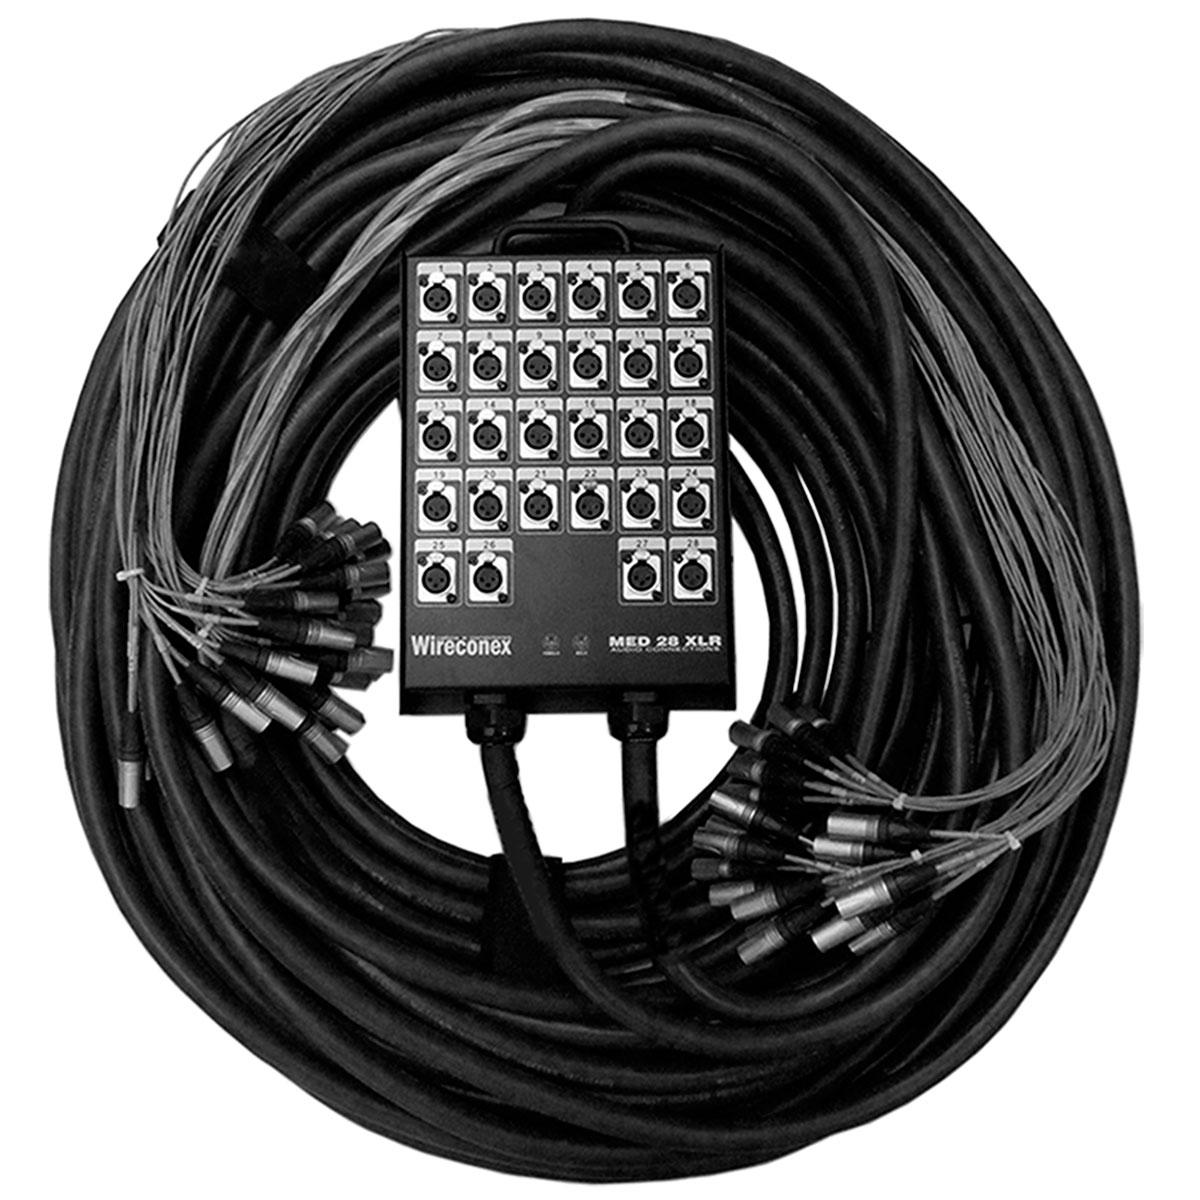 Multicabo Completo Spliter 28 Vias XLR M / XLR F 40MT x 10MT - VR CABOS